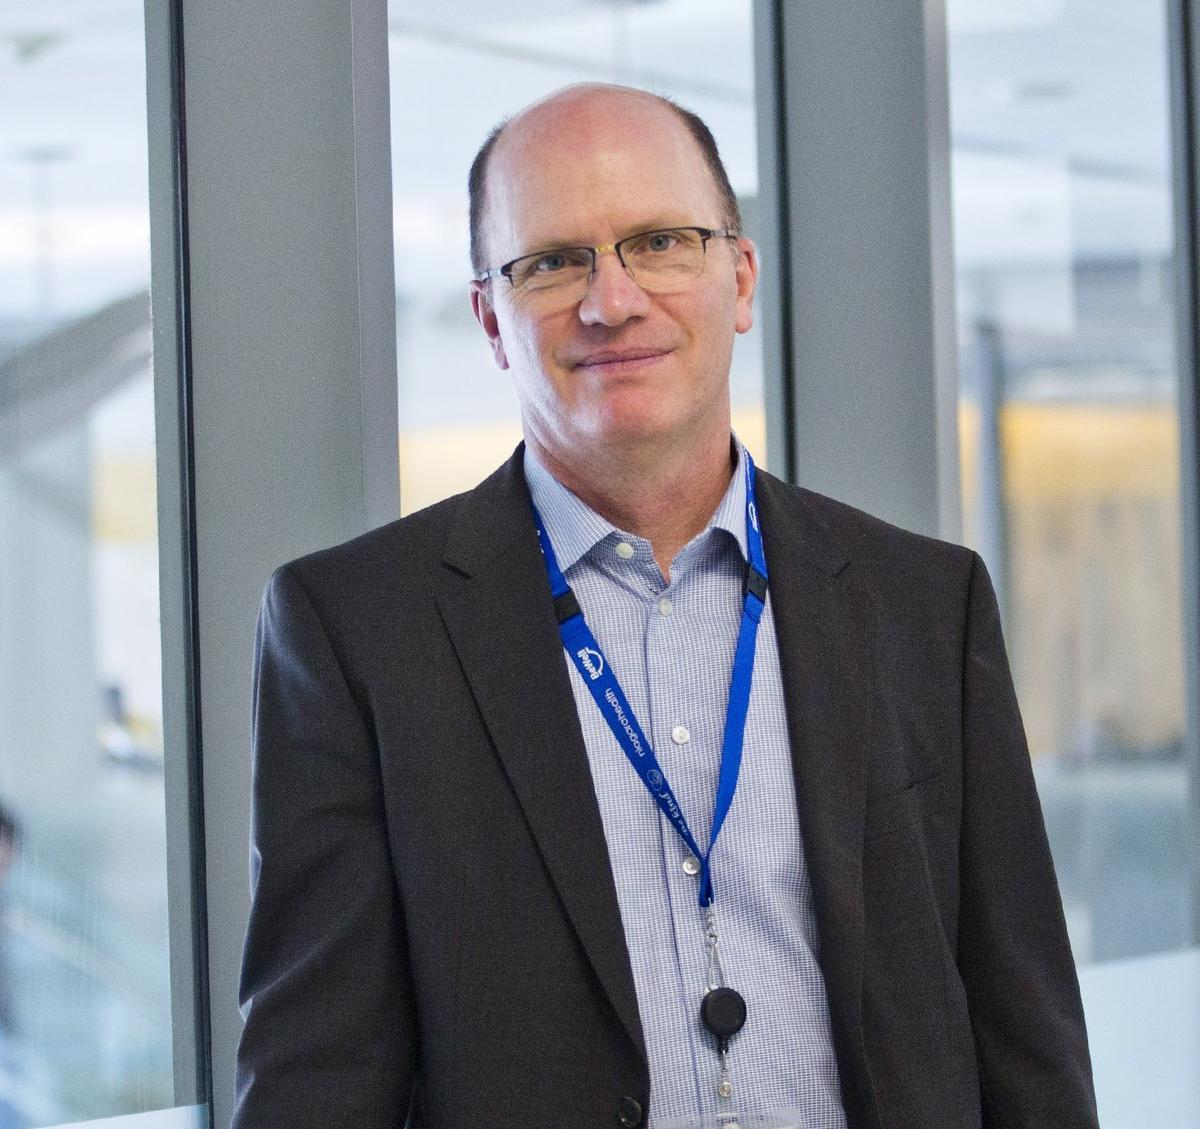 Dr. Tom Stewart, CEO, Niagara Health and St. Joseph's Healthcare Hamilton